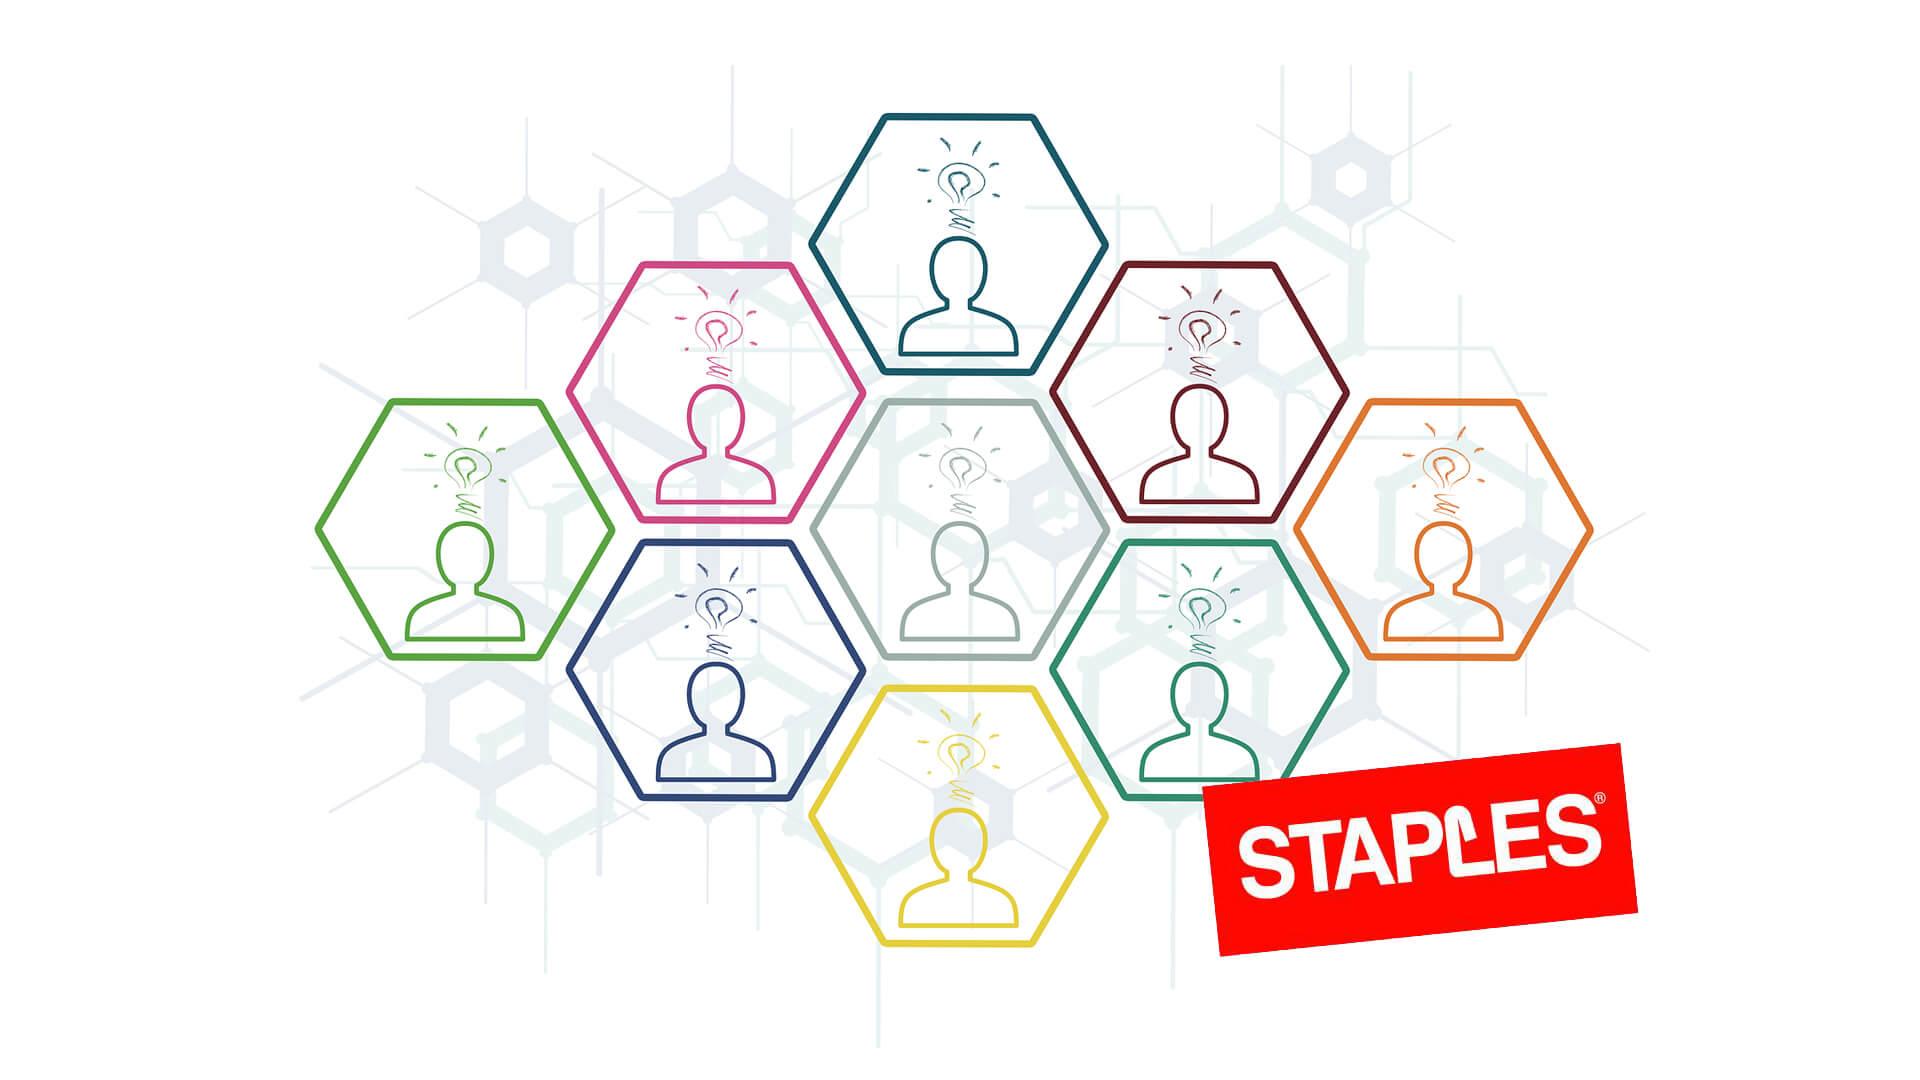 Staples Foundation Community Grant